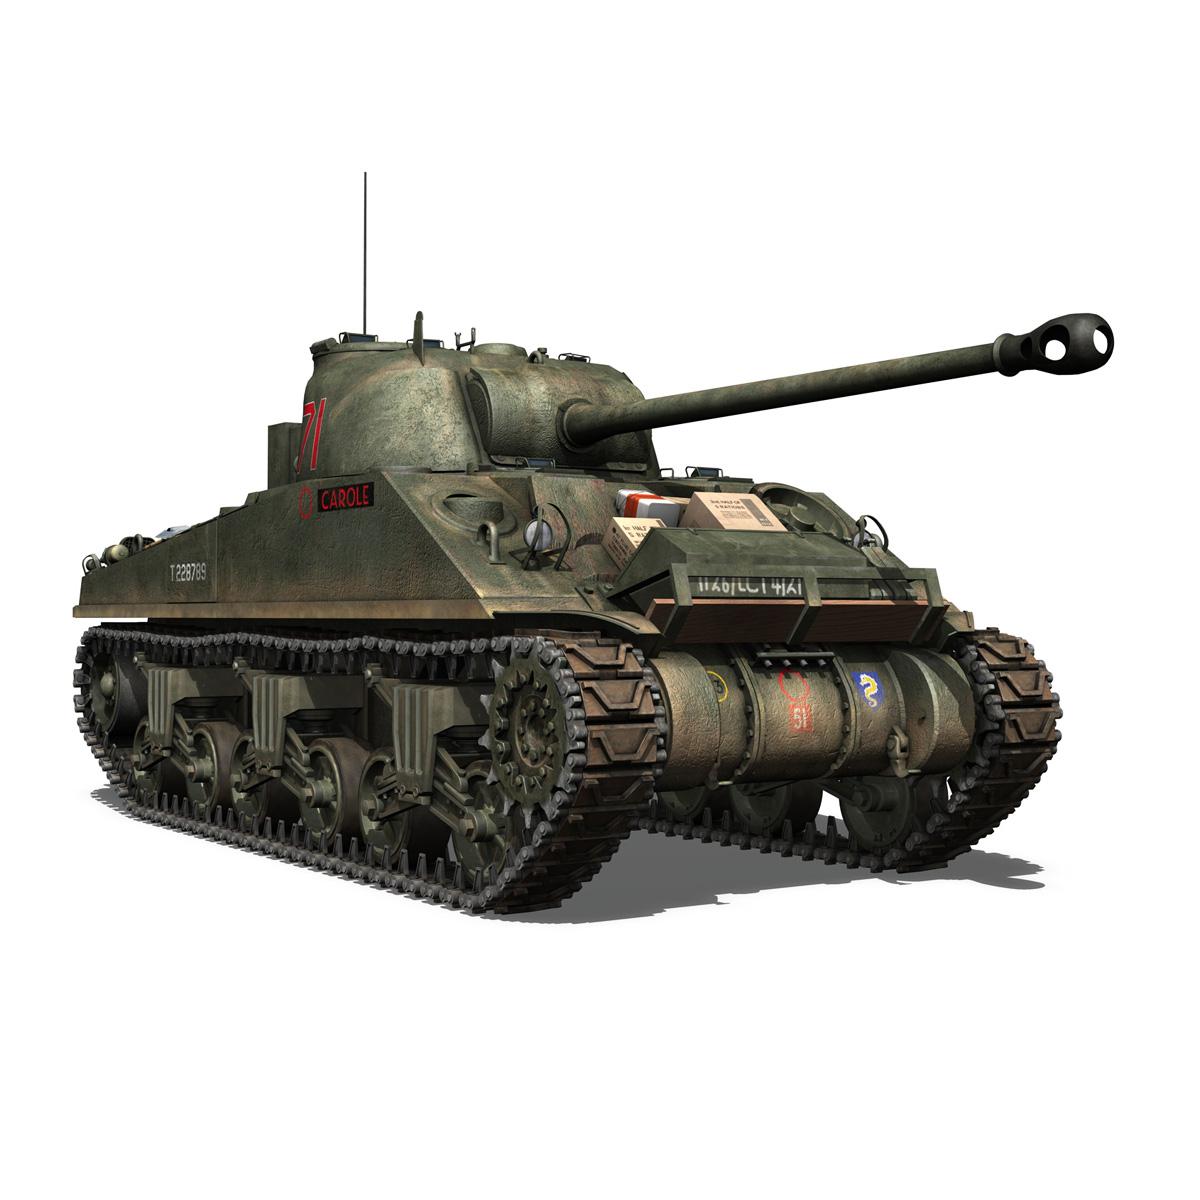 sherman mk vc firefly - karols 3d modelis 3ds fbx c4d lwo obj 267433